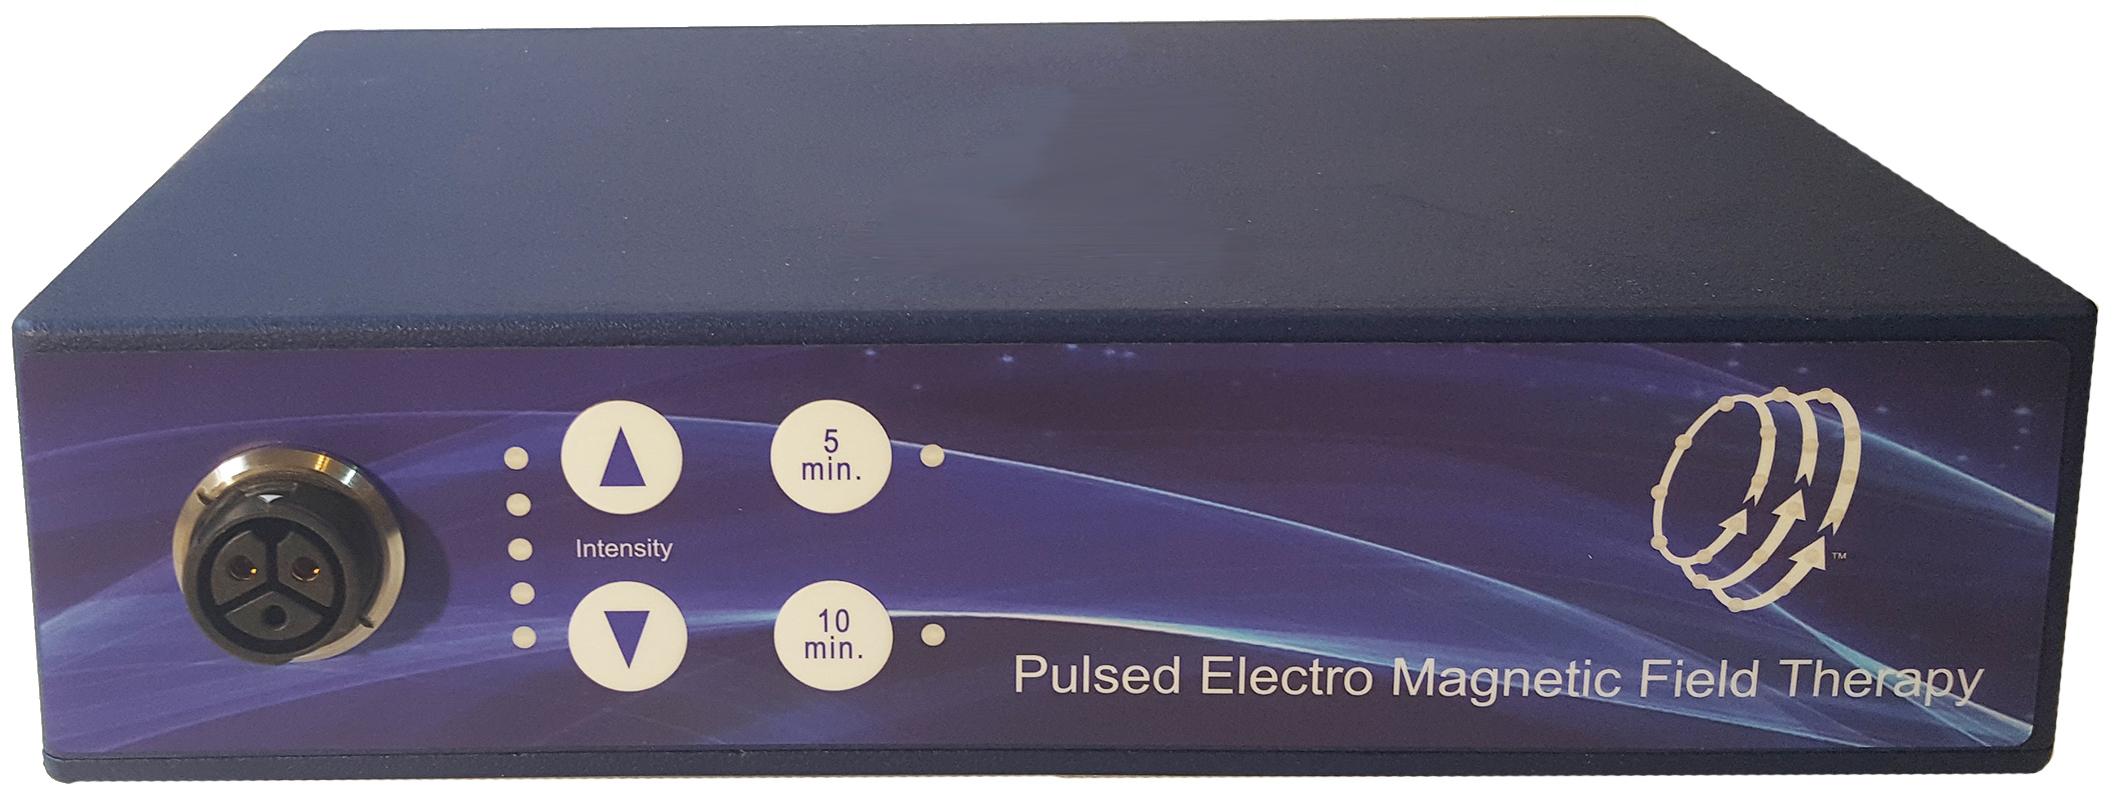 Magnus Pro X1 Clinic MP - $7,995*